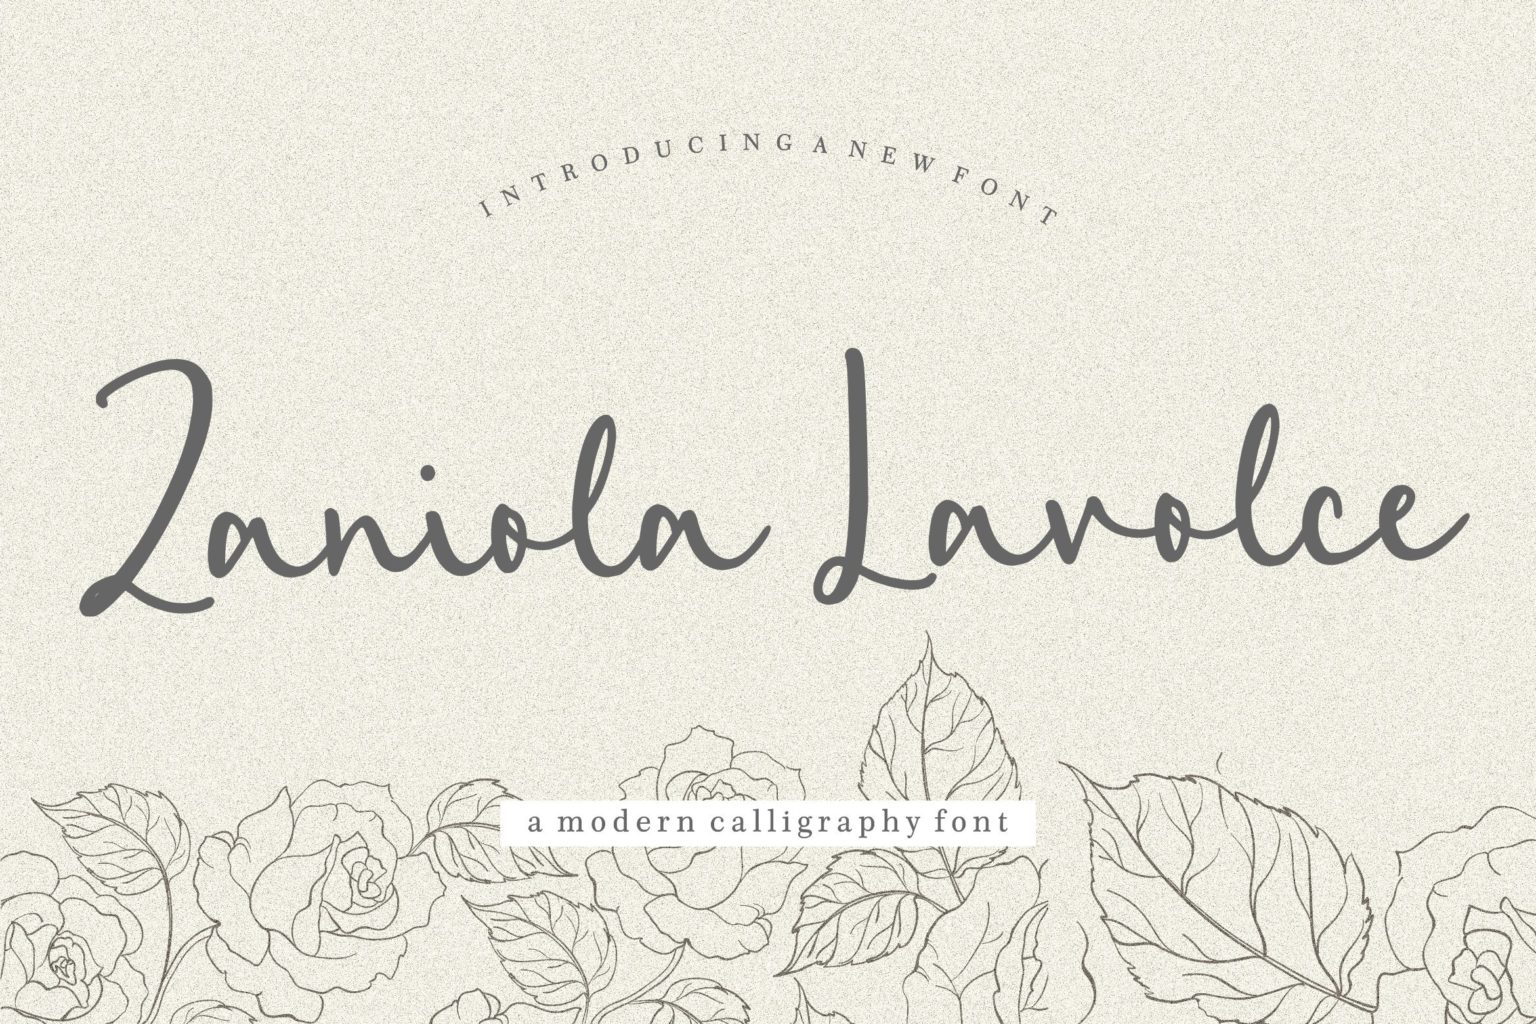 Zaniola Lavolce Modern Callihgraphy Font-1